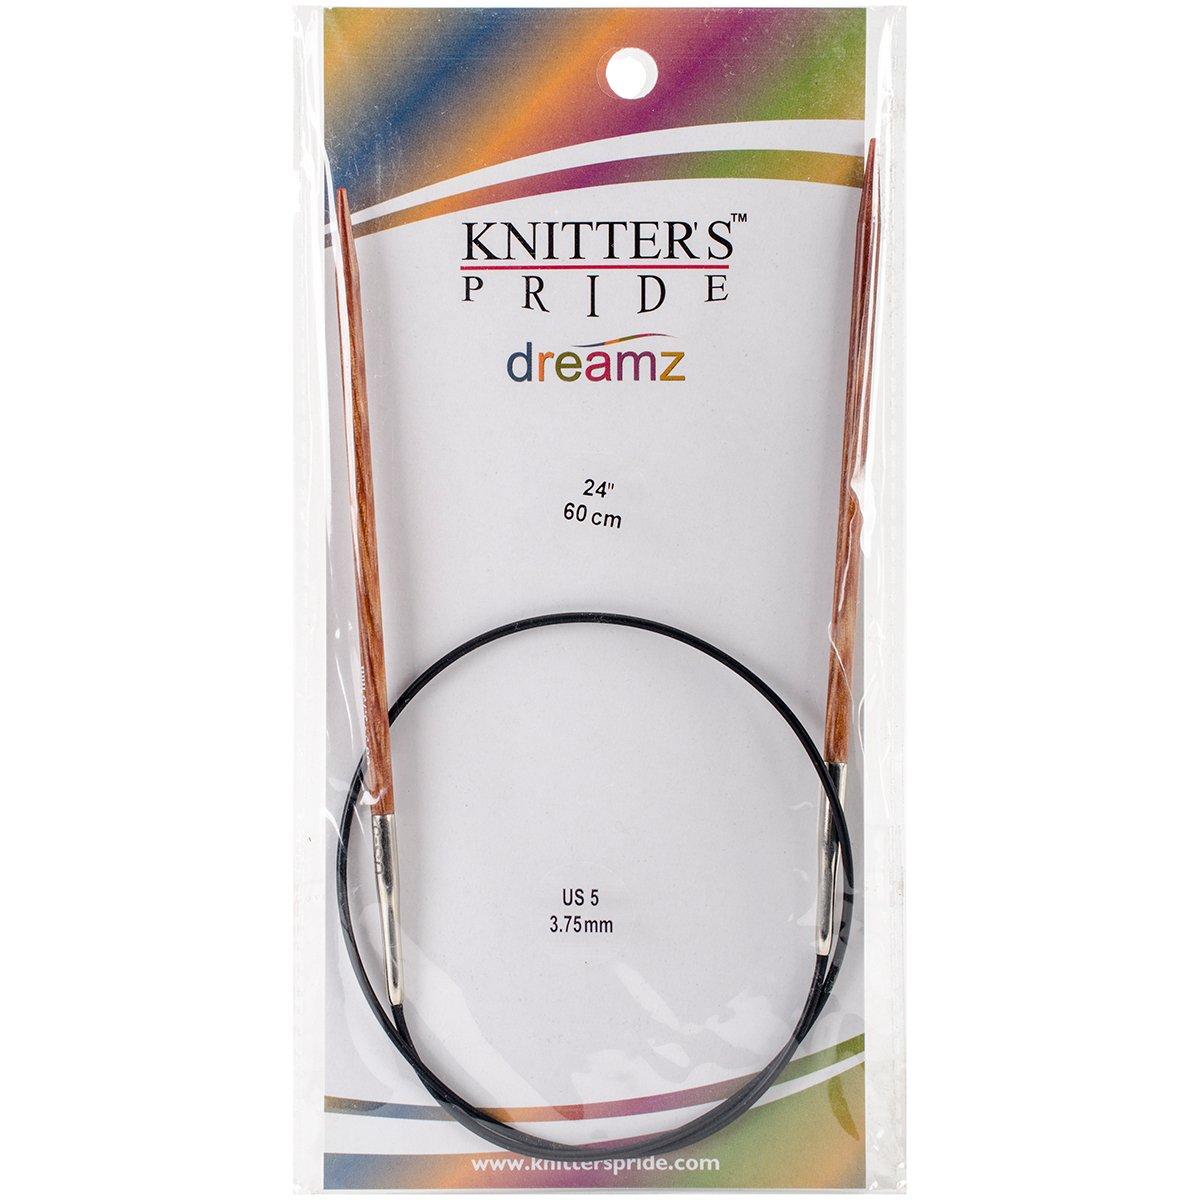 24 Knitters Pride 10//6mm Dreamz Fixed Circular Needles